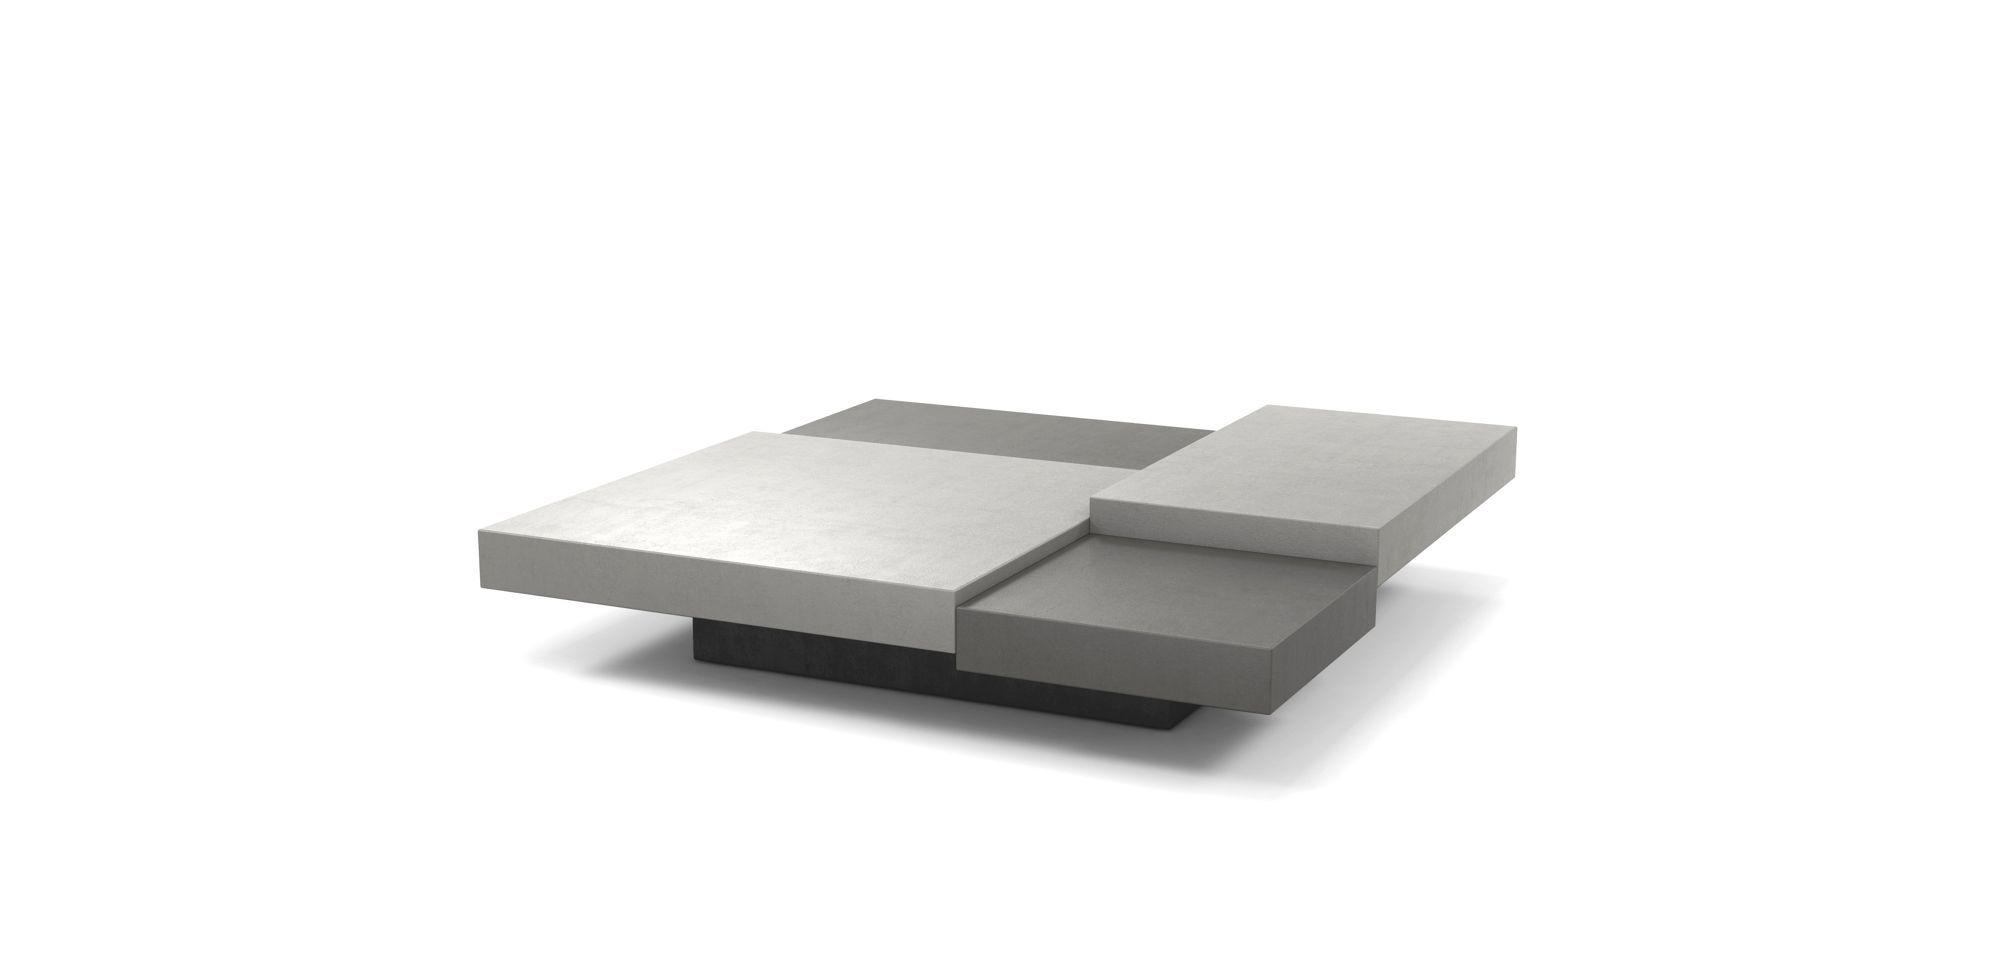 99f03e743a4a7002bd2cac038a3e680e Meilleur De De Table Basse Bois Moderne Concept